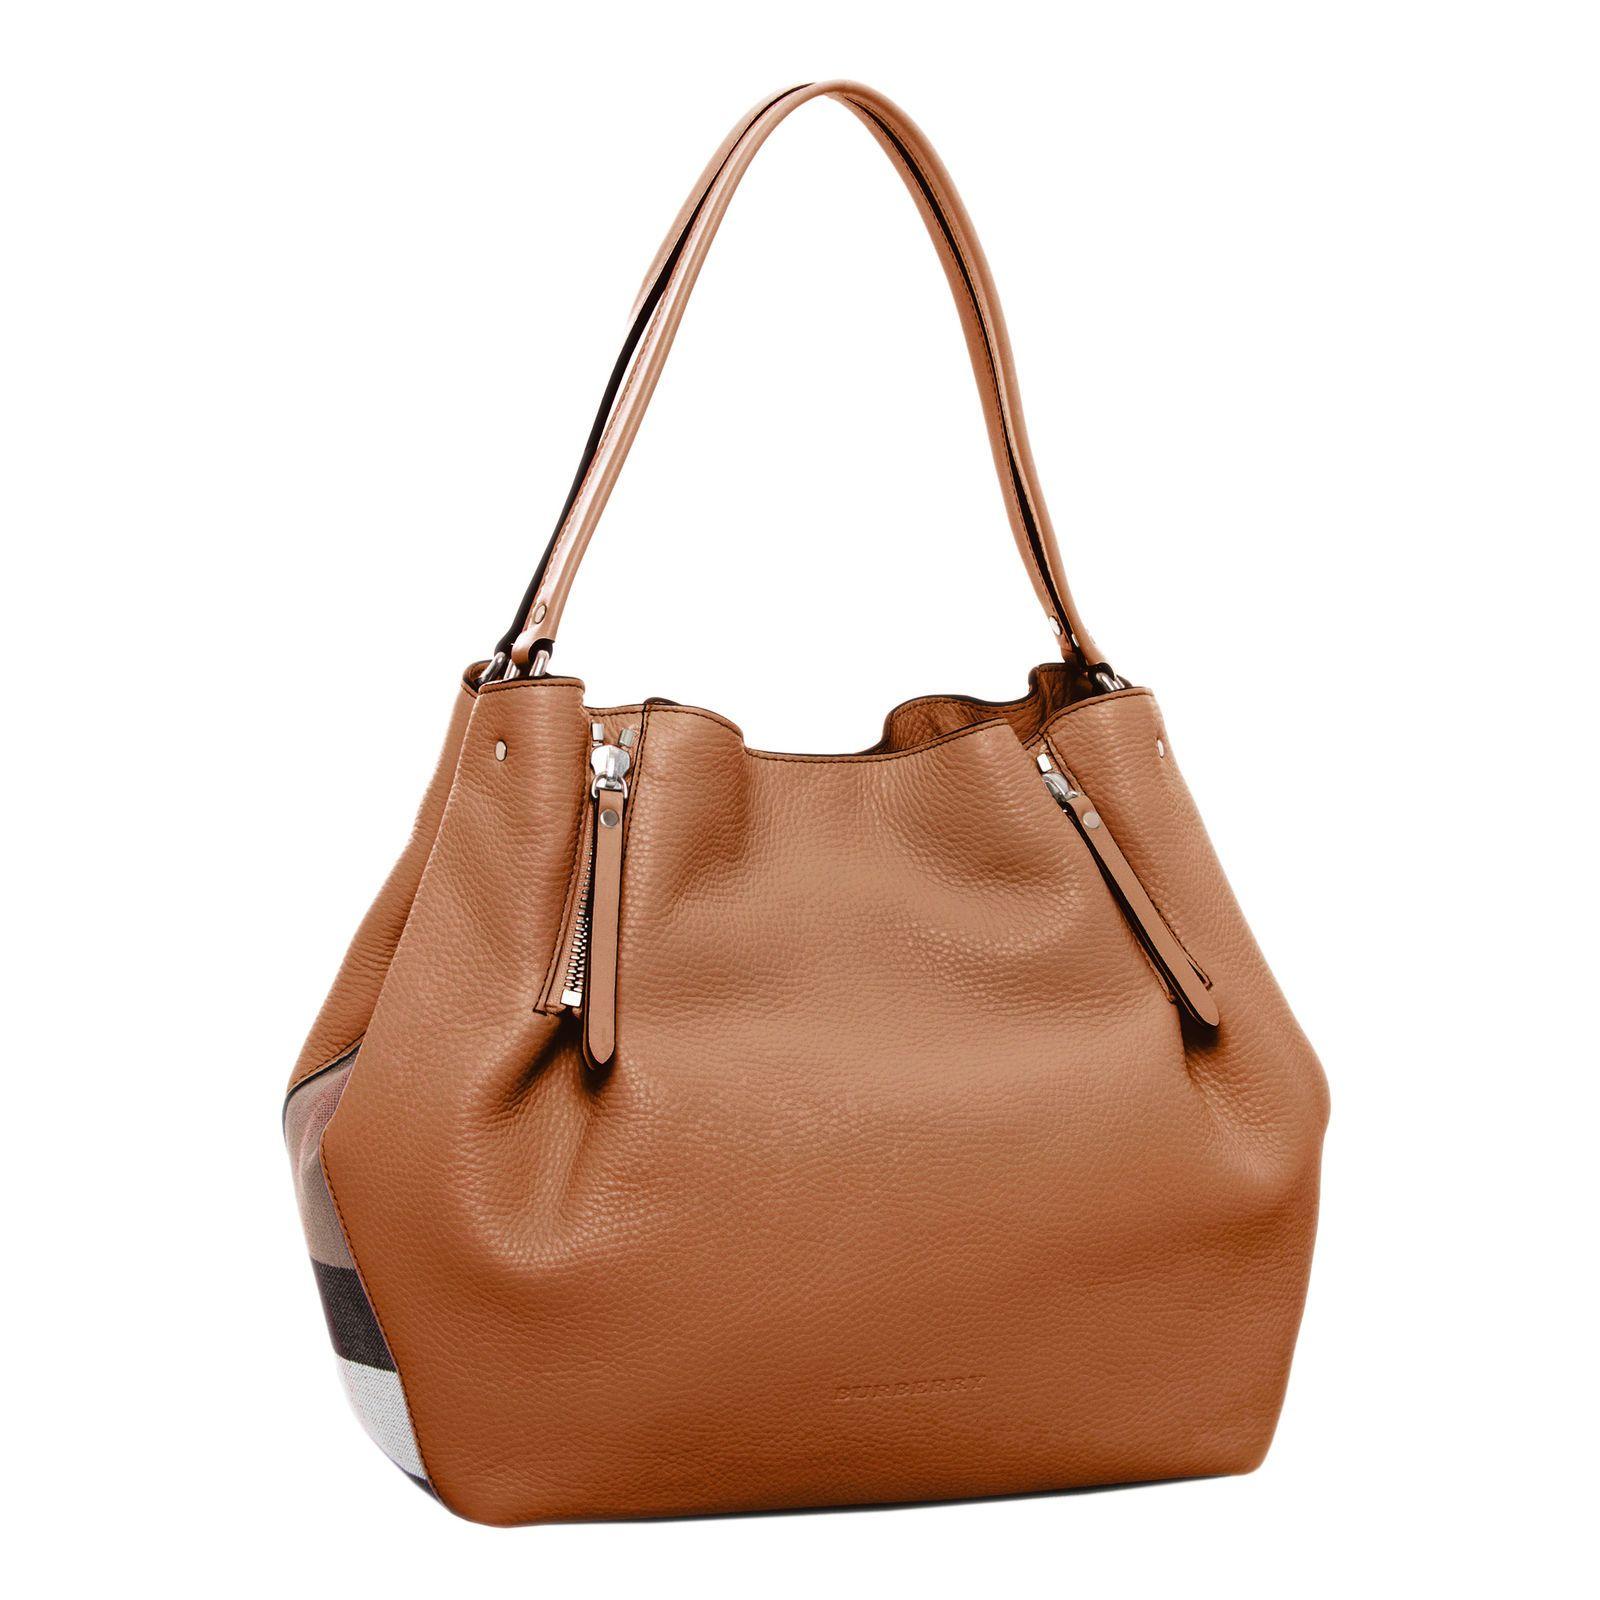 dab5ceb502a Burberry Women s Brit Medium Maidstone Leather and Canvas Handbag Brown